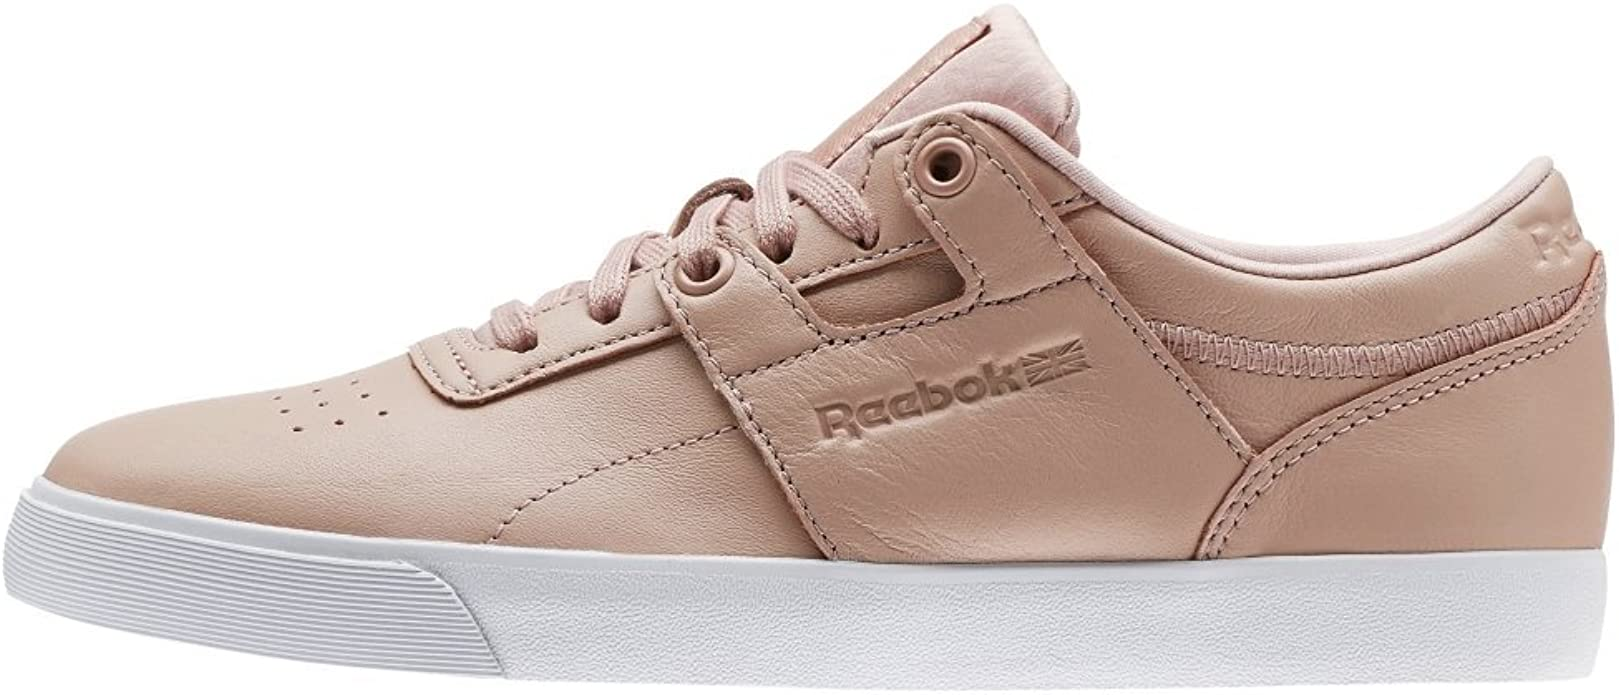 Reebok Chaussures Workout Clean FVS Fbt RoseBlanc Taille